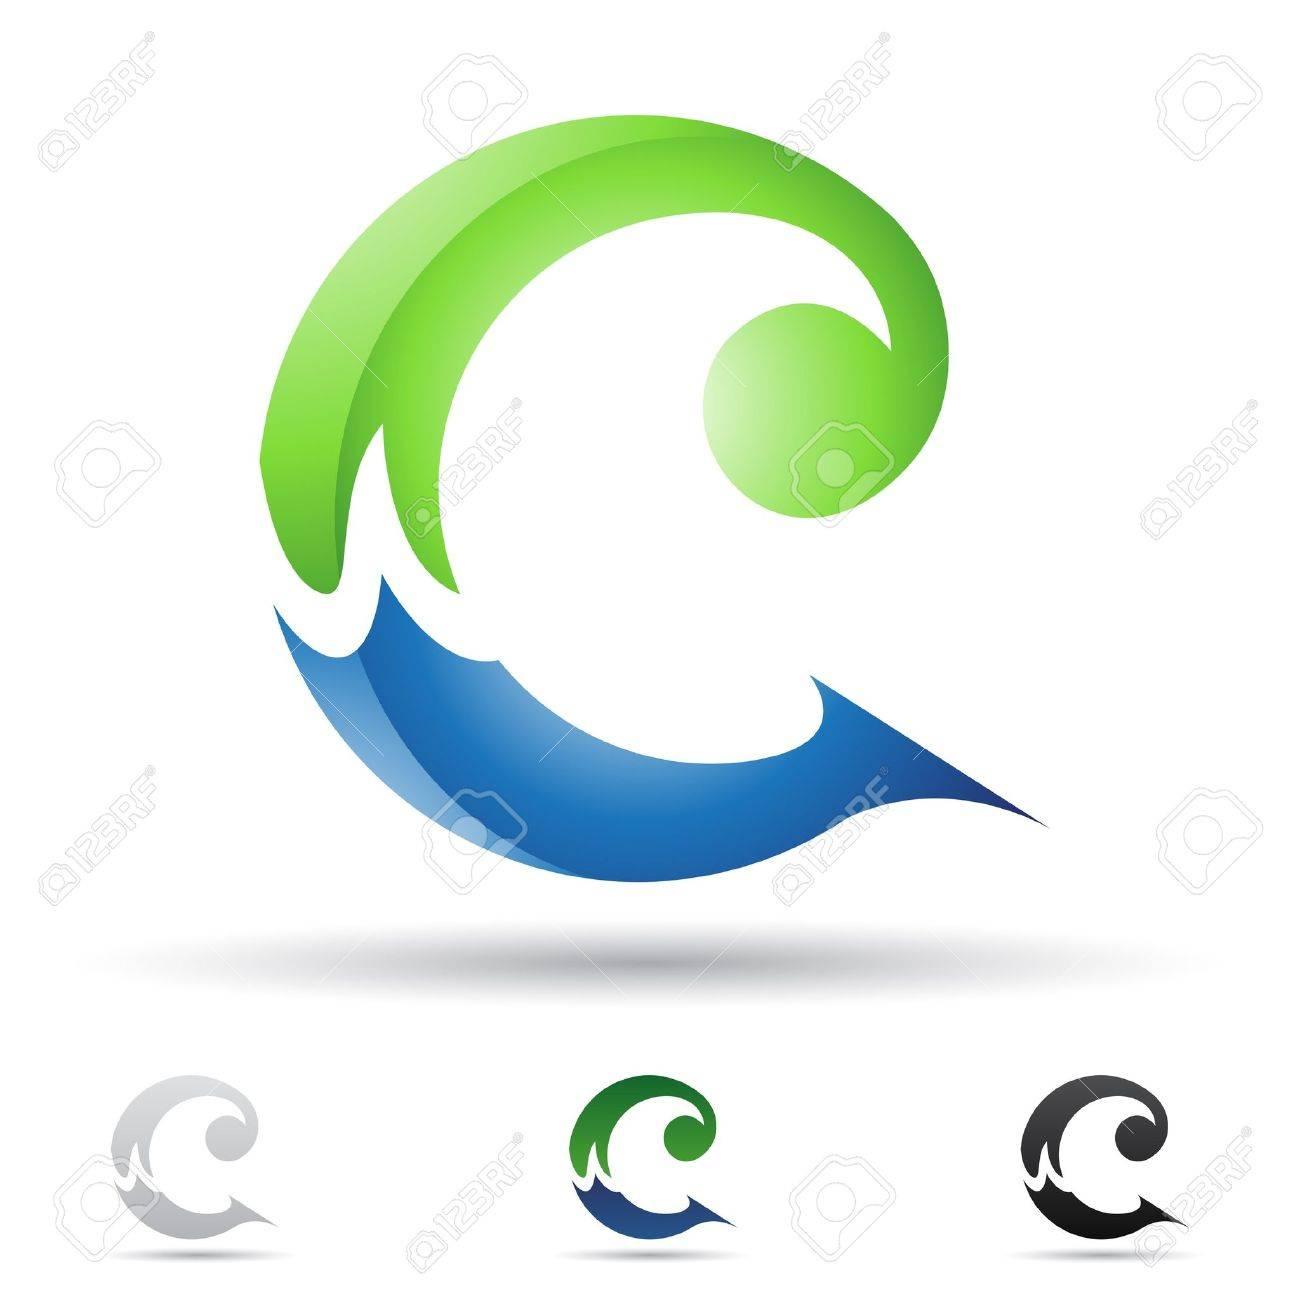 CC Designs Rubber Stamps